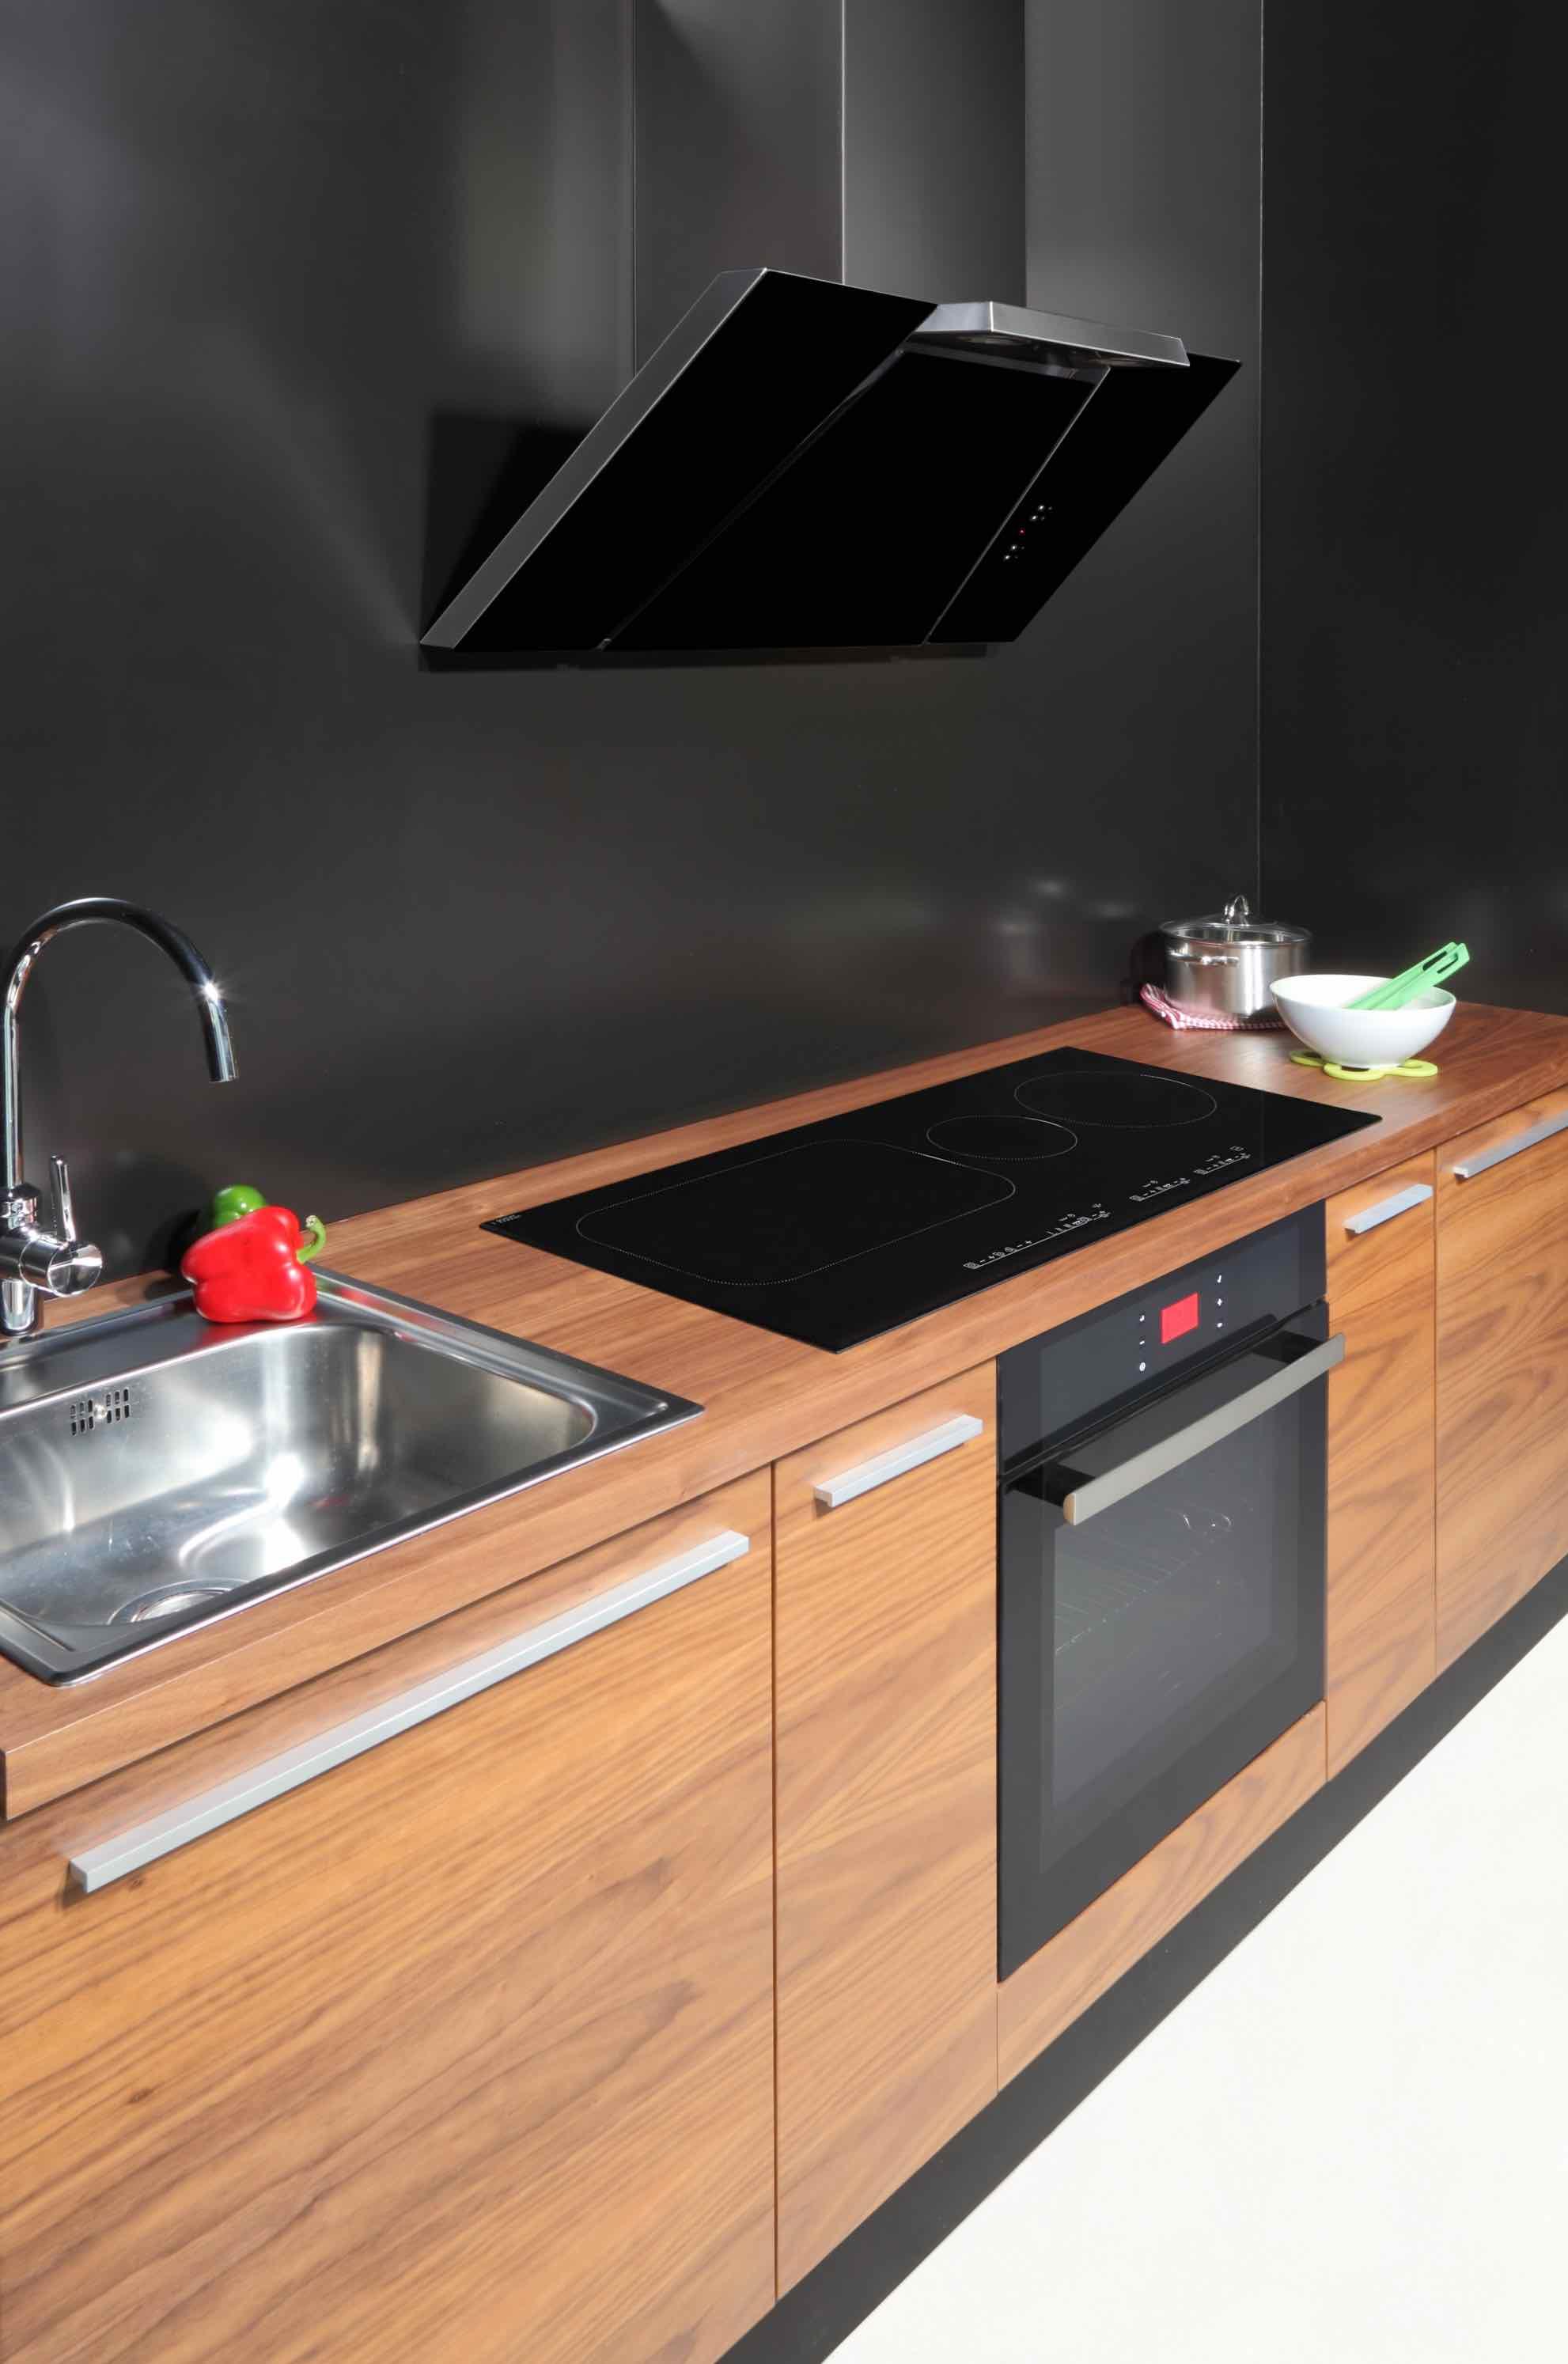 Campanas de cocina en casas pasivas o passivhaus evowall - Campana de la cocina ...